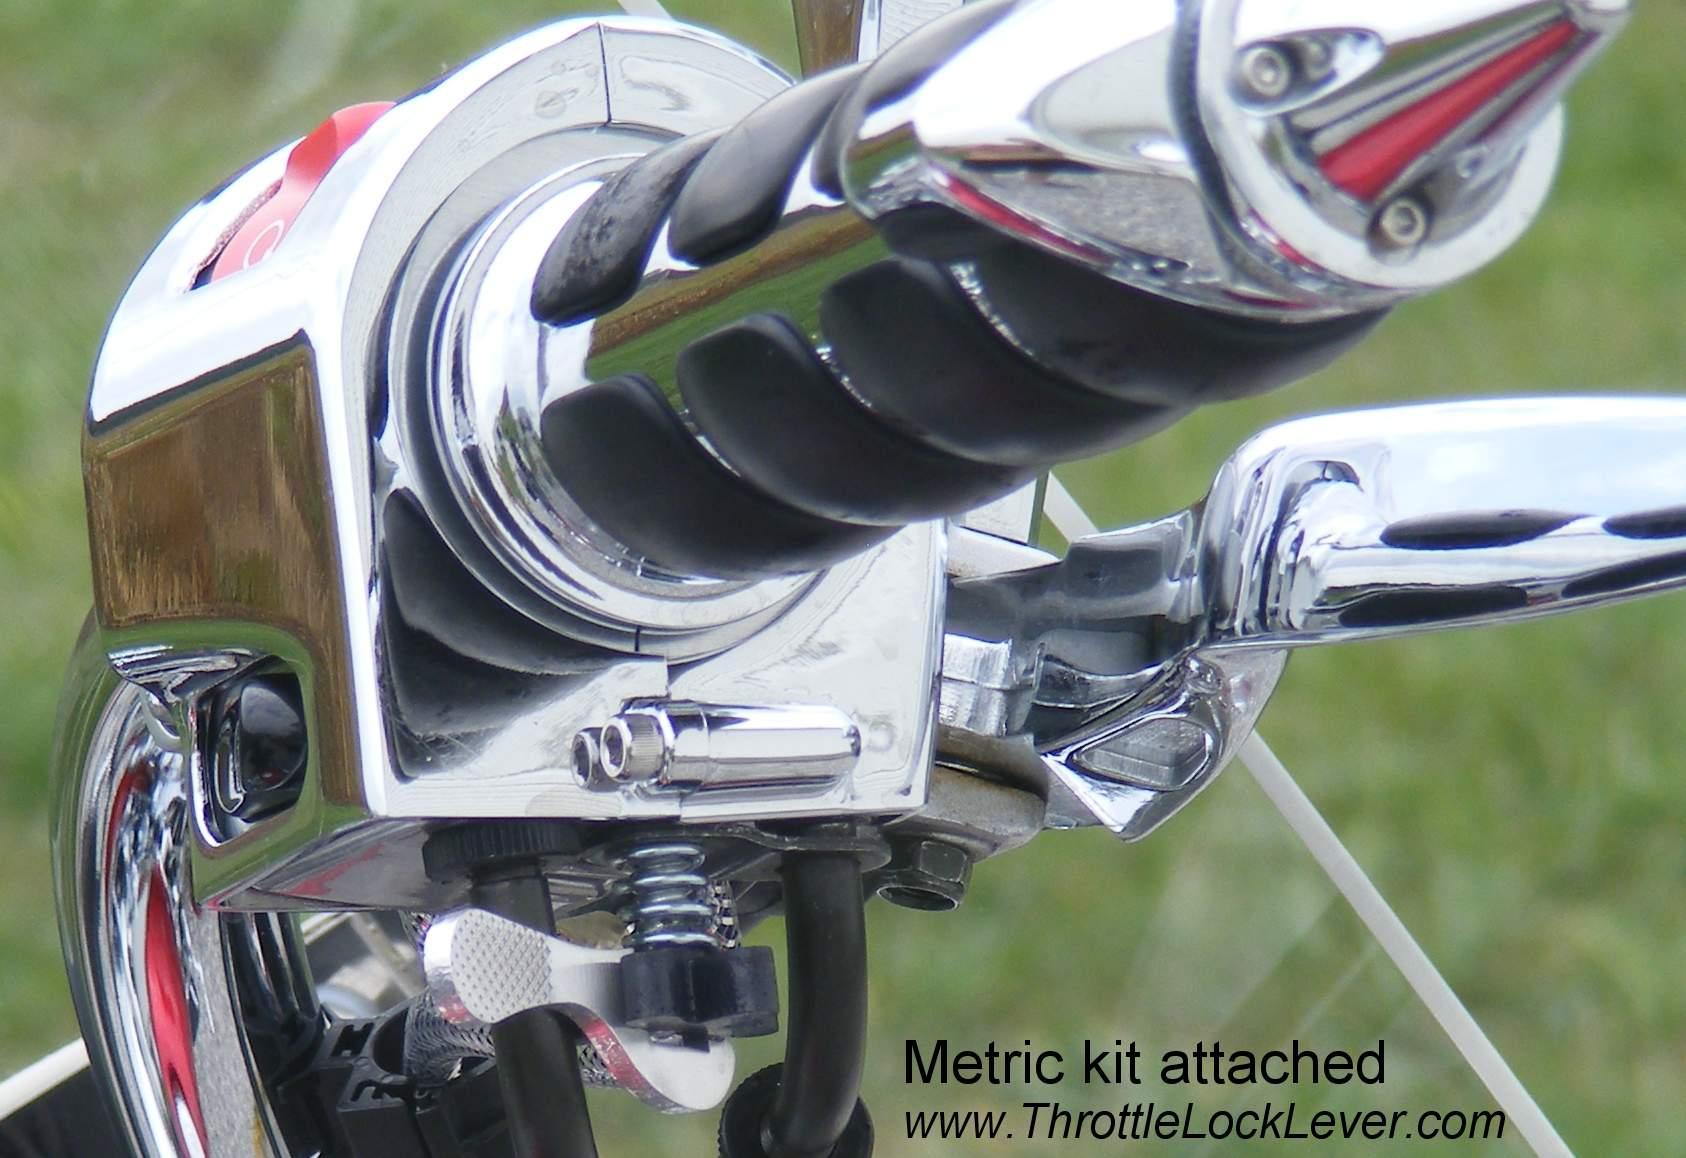 Throttle Lock Lever Kits For Metrics